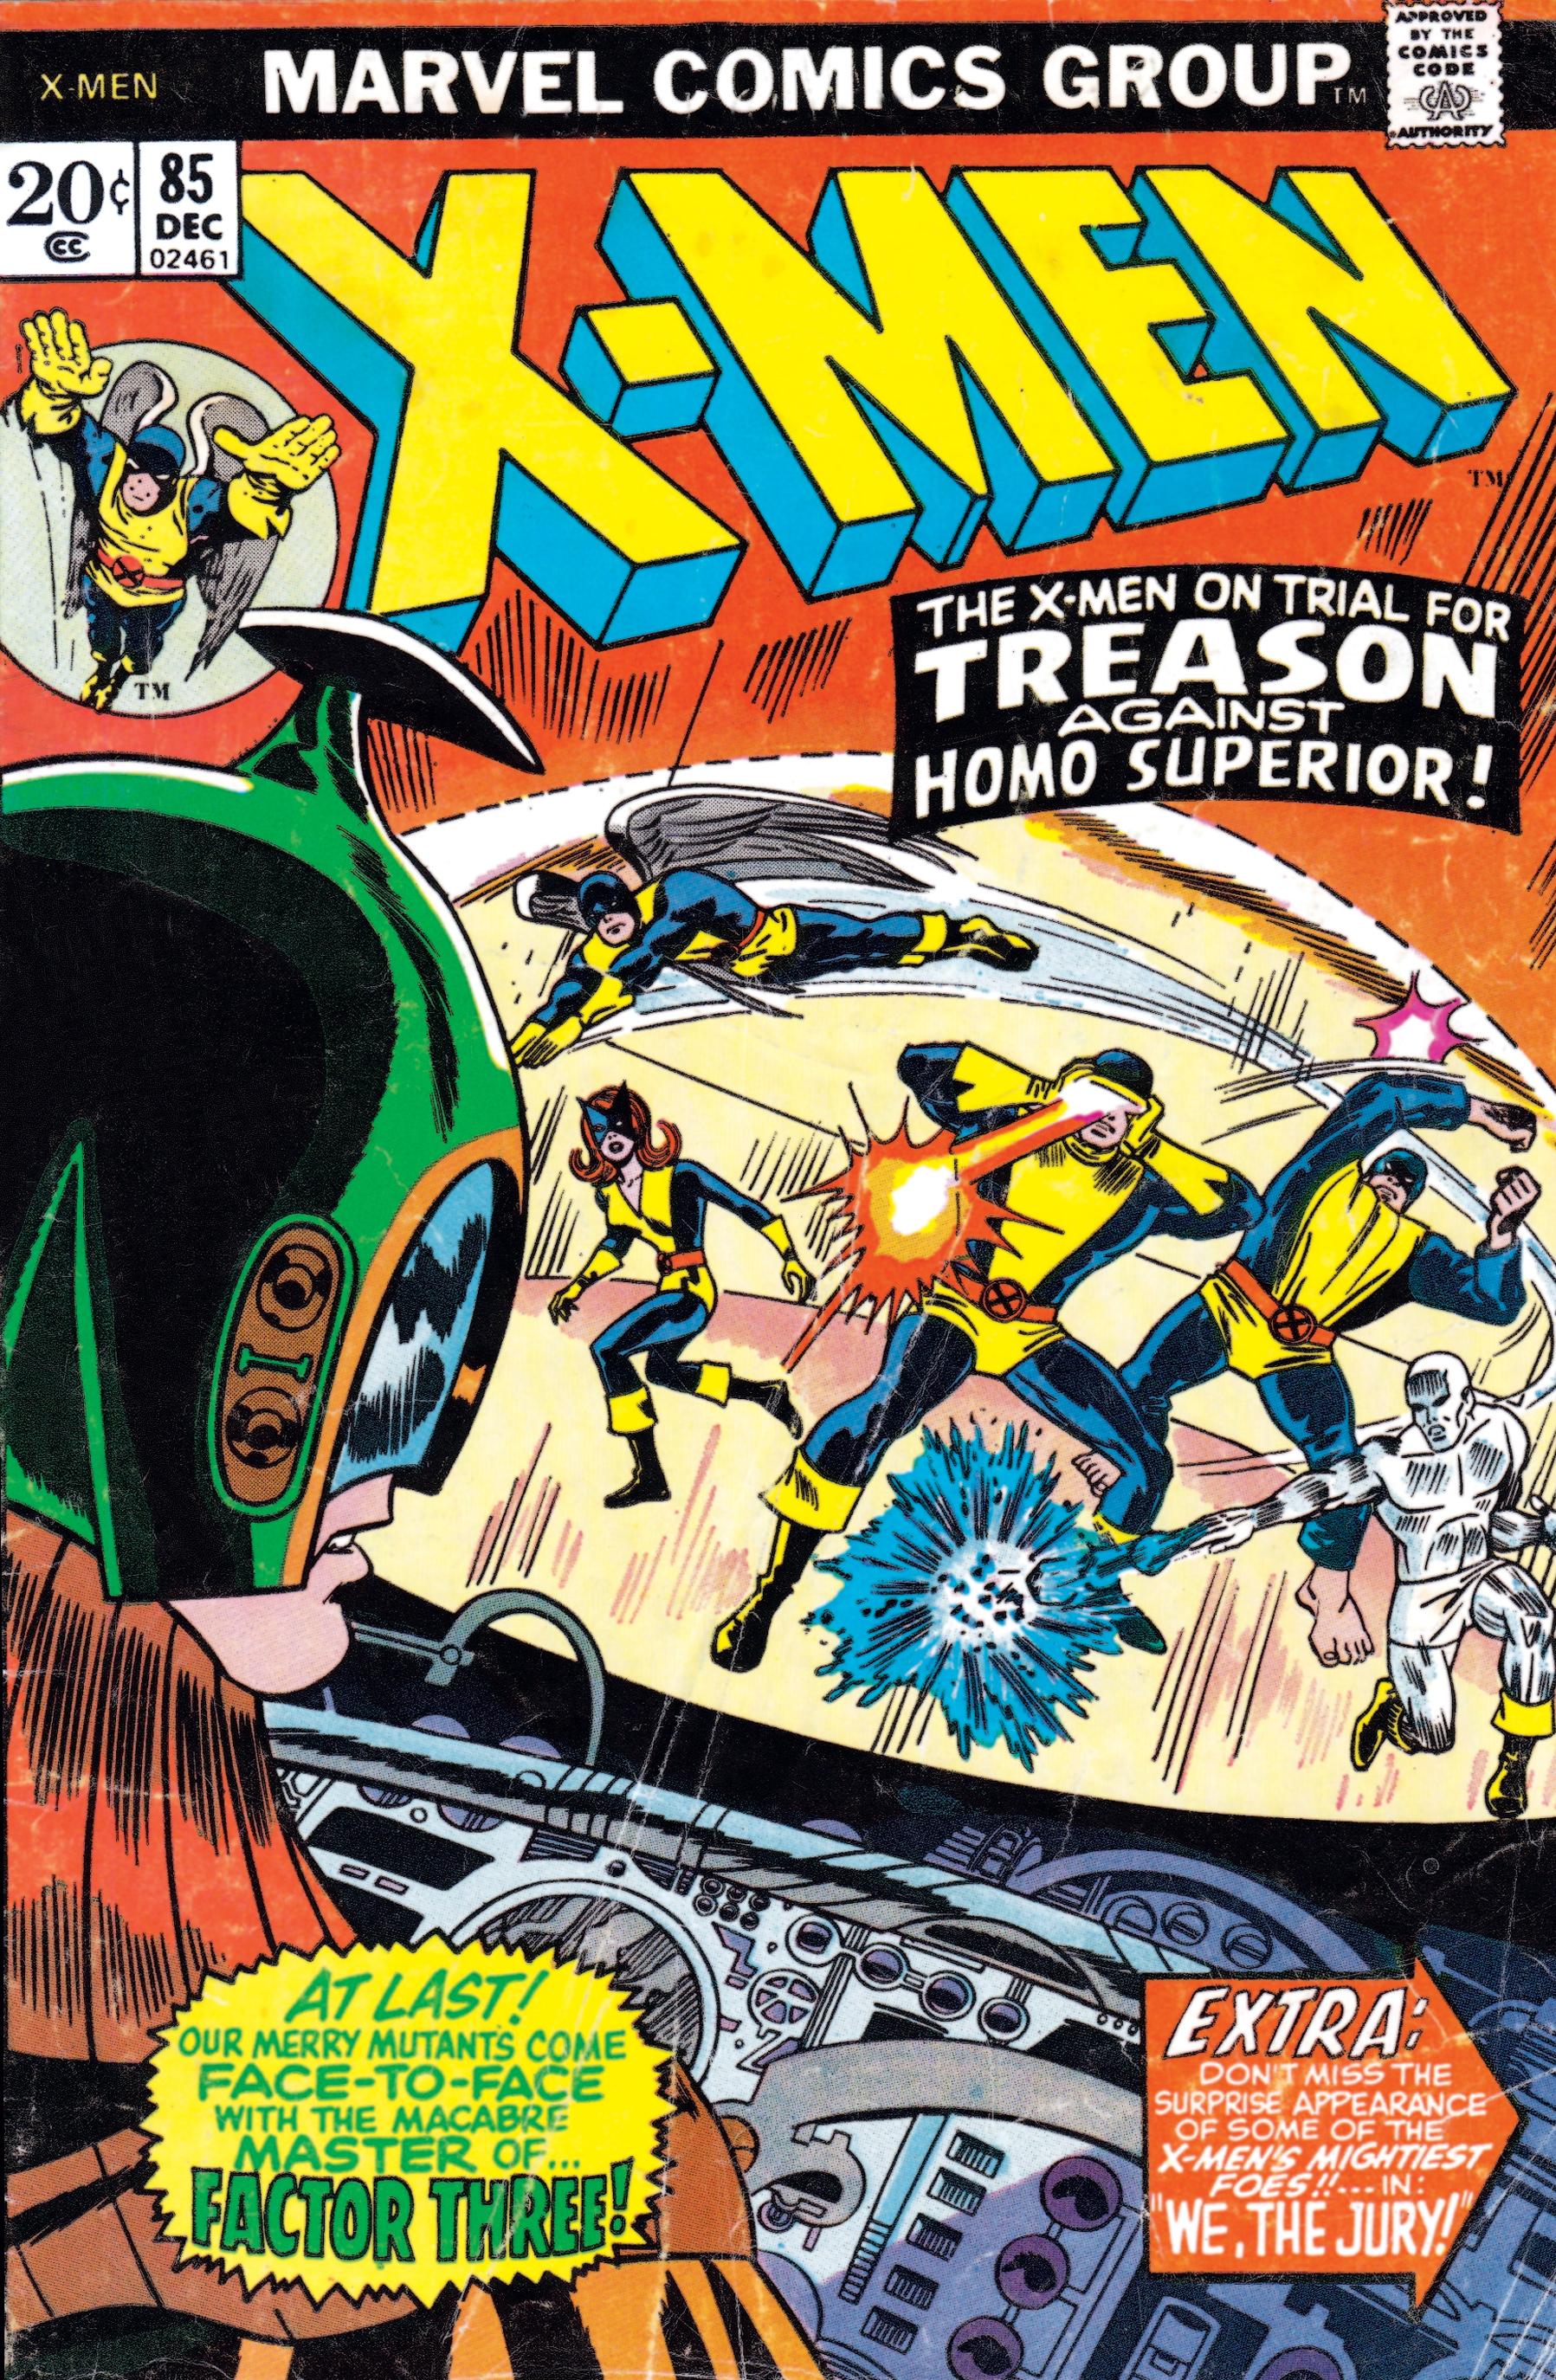 Uncanny X-Men (1963) #85